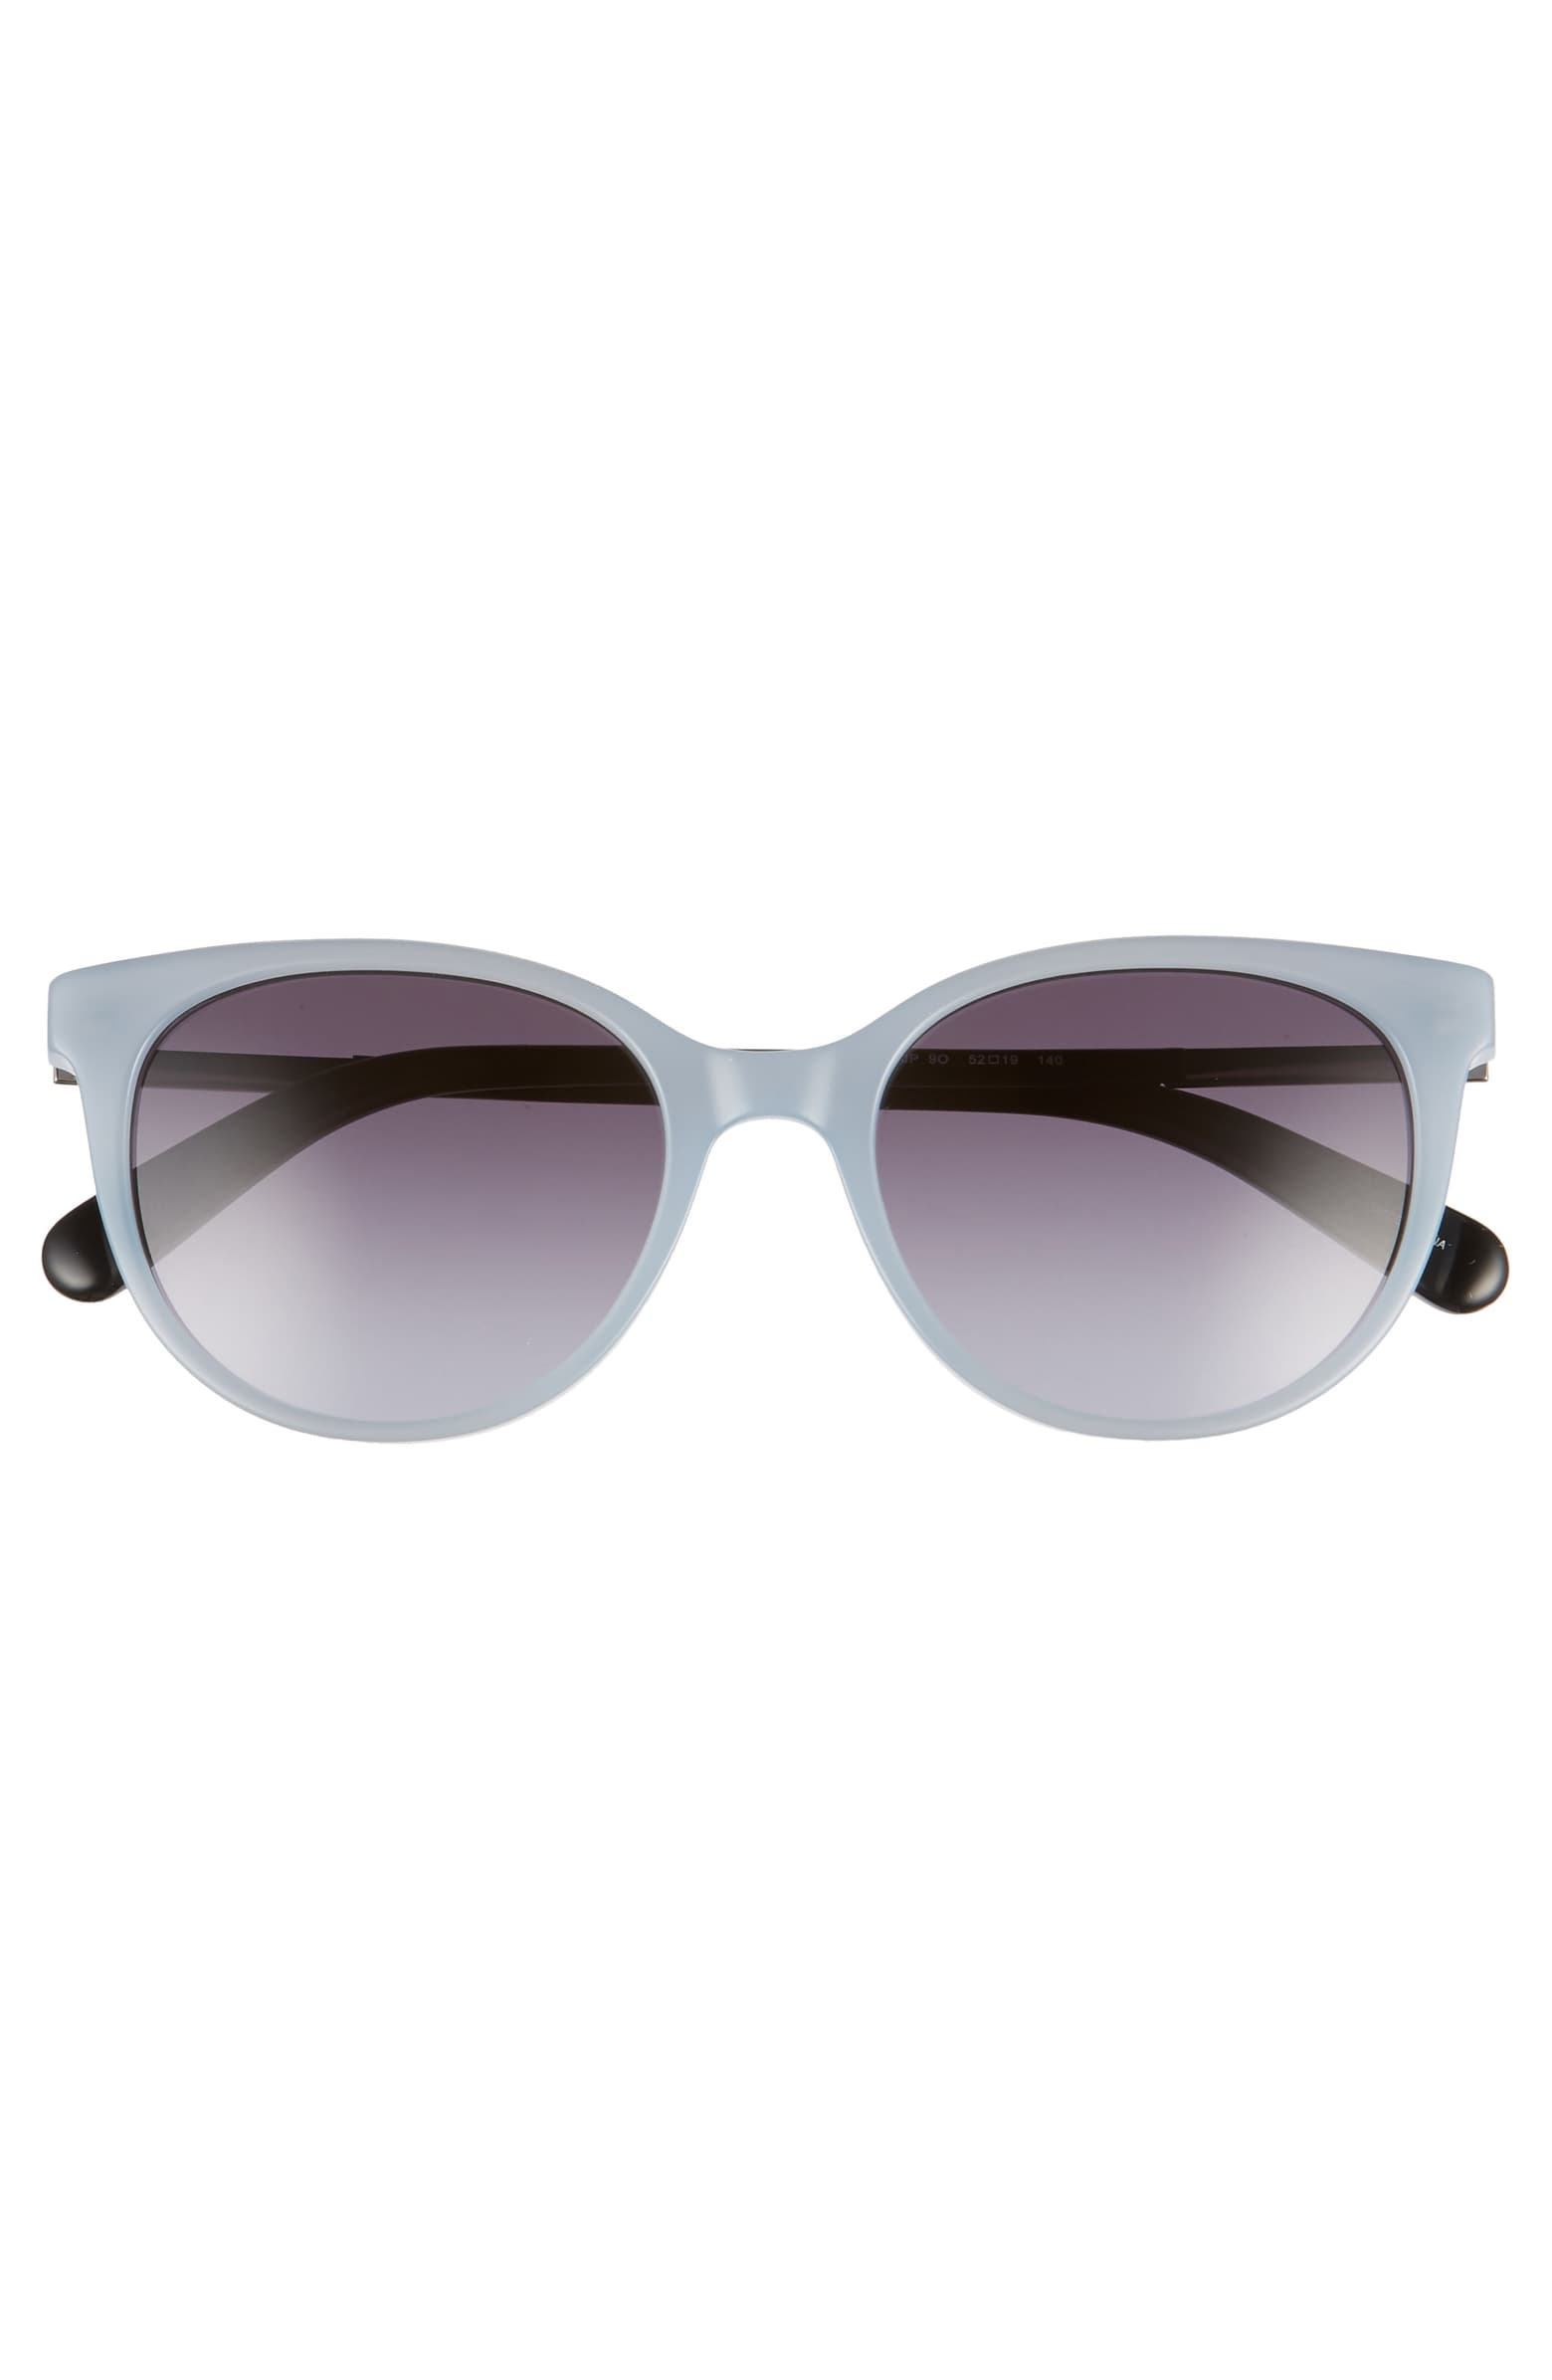 Rebeccca Minkoff Indio 52mm Gradient Cat Eye Sunglasses